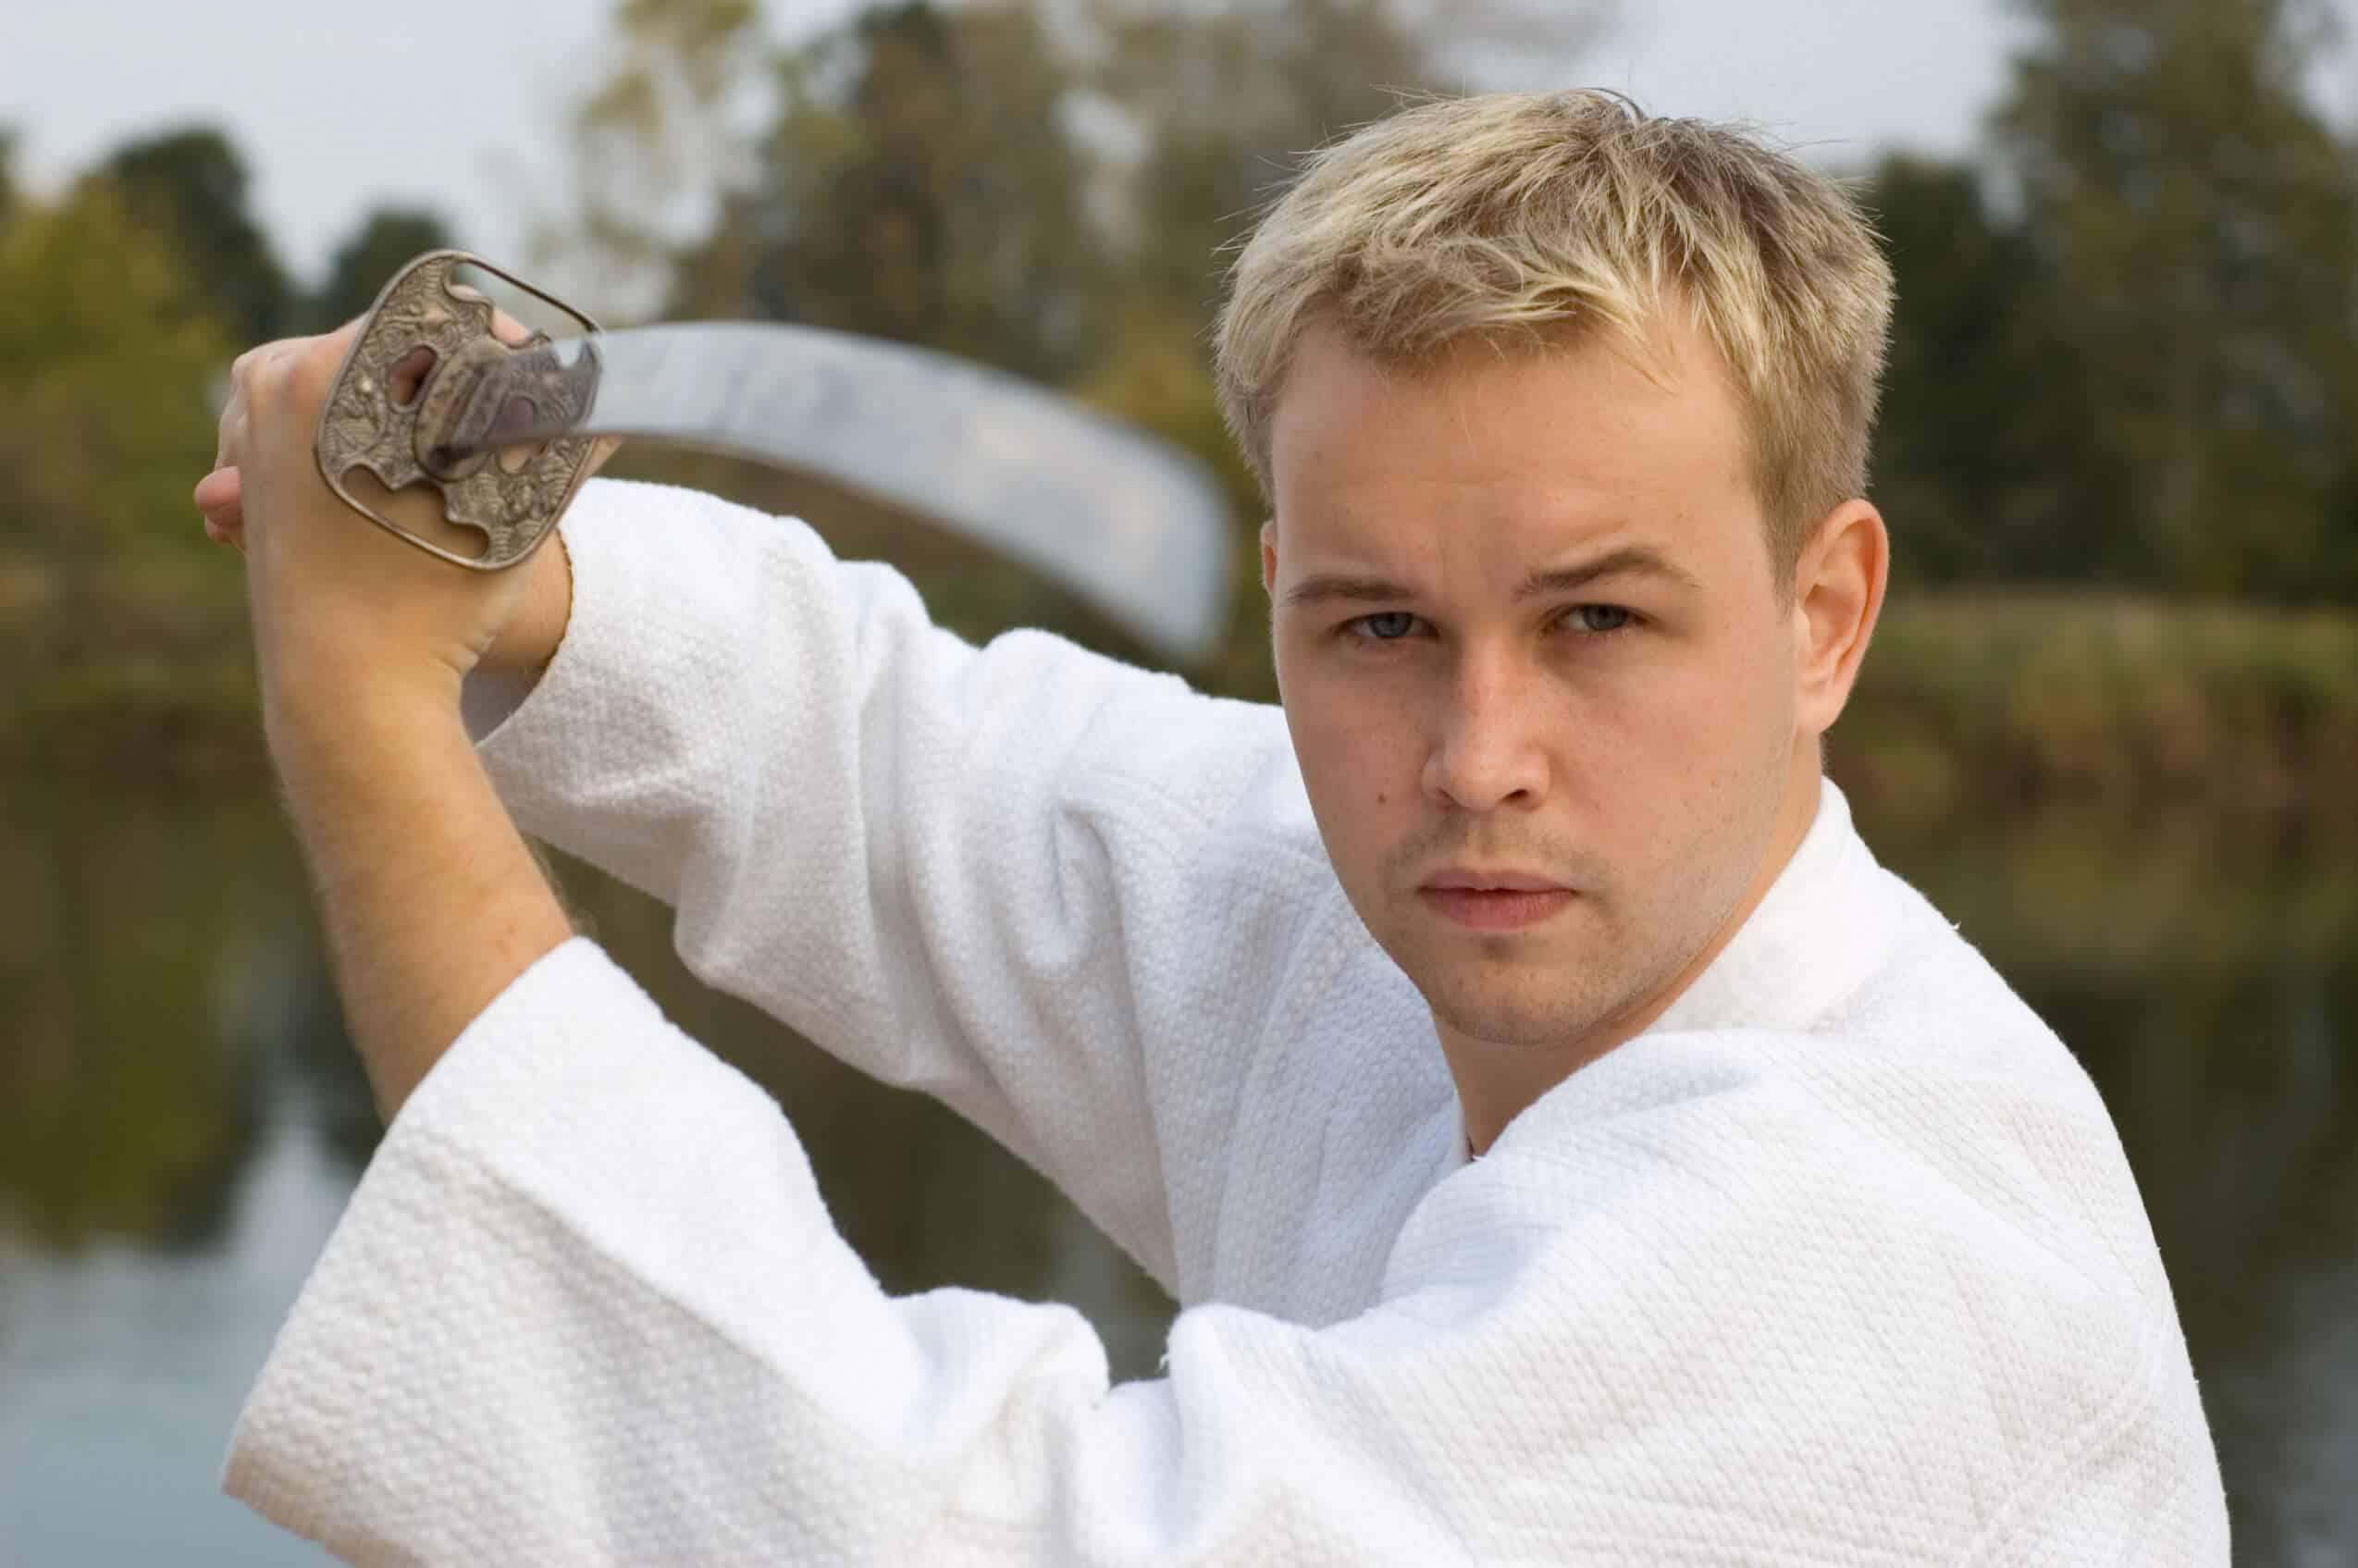 Martial Arts Lessons for Adults in Lake Jackson TX - Samurai Sword Posing Blog